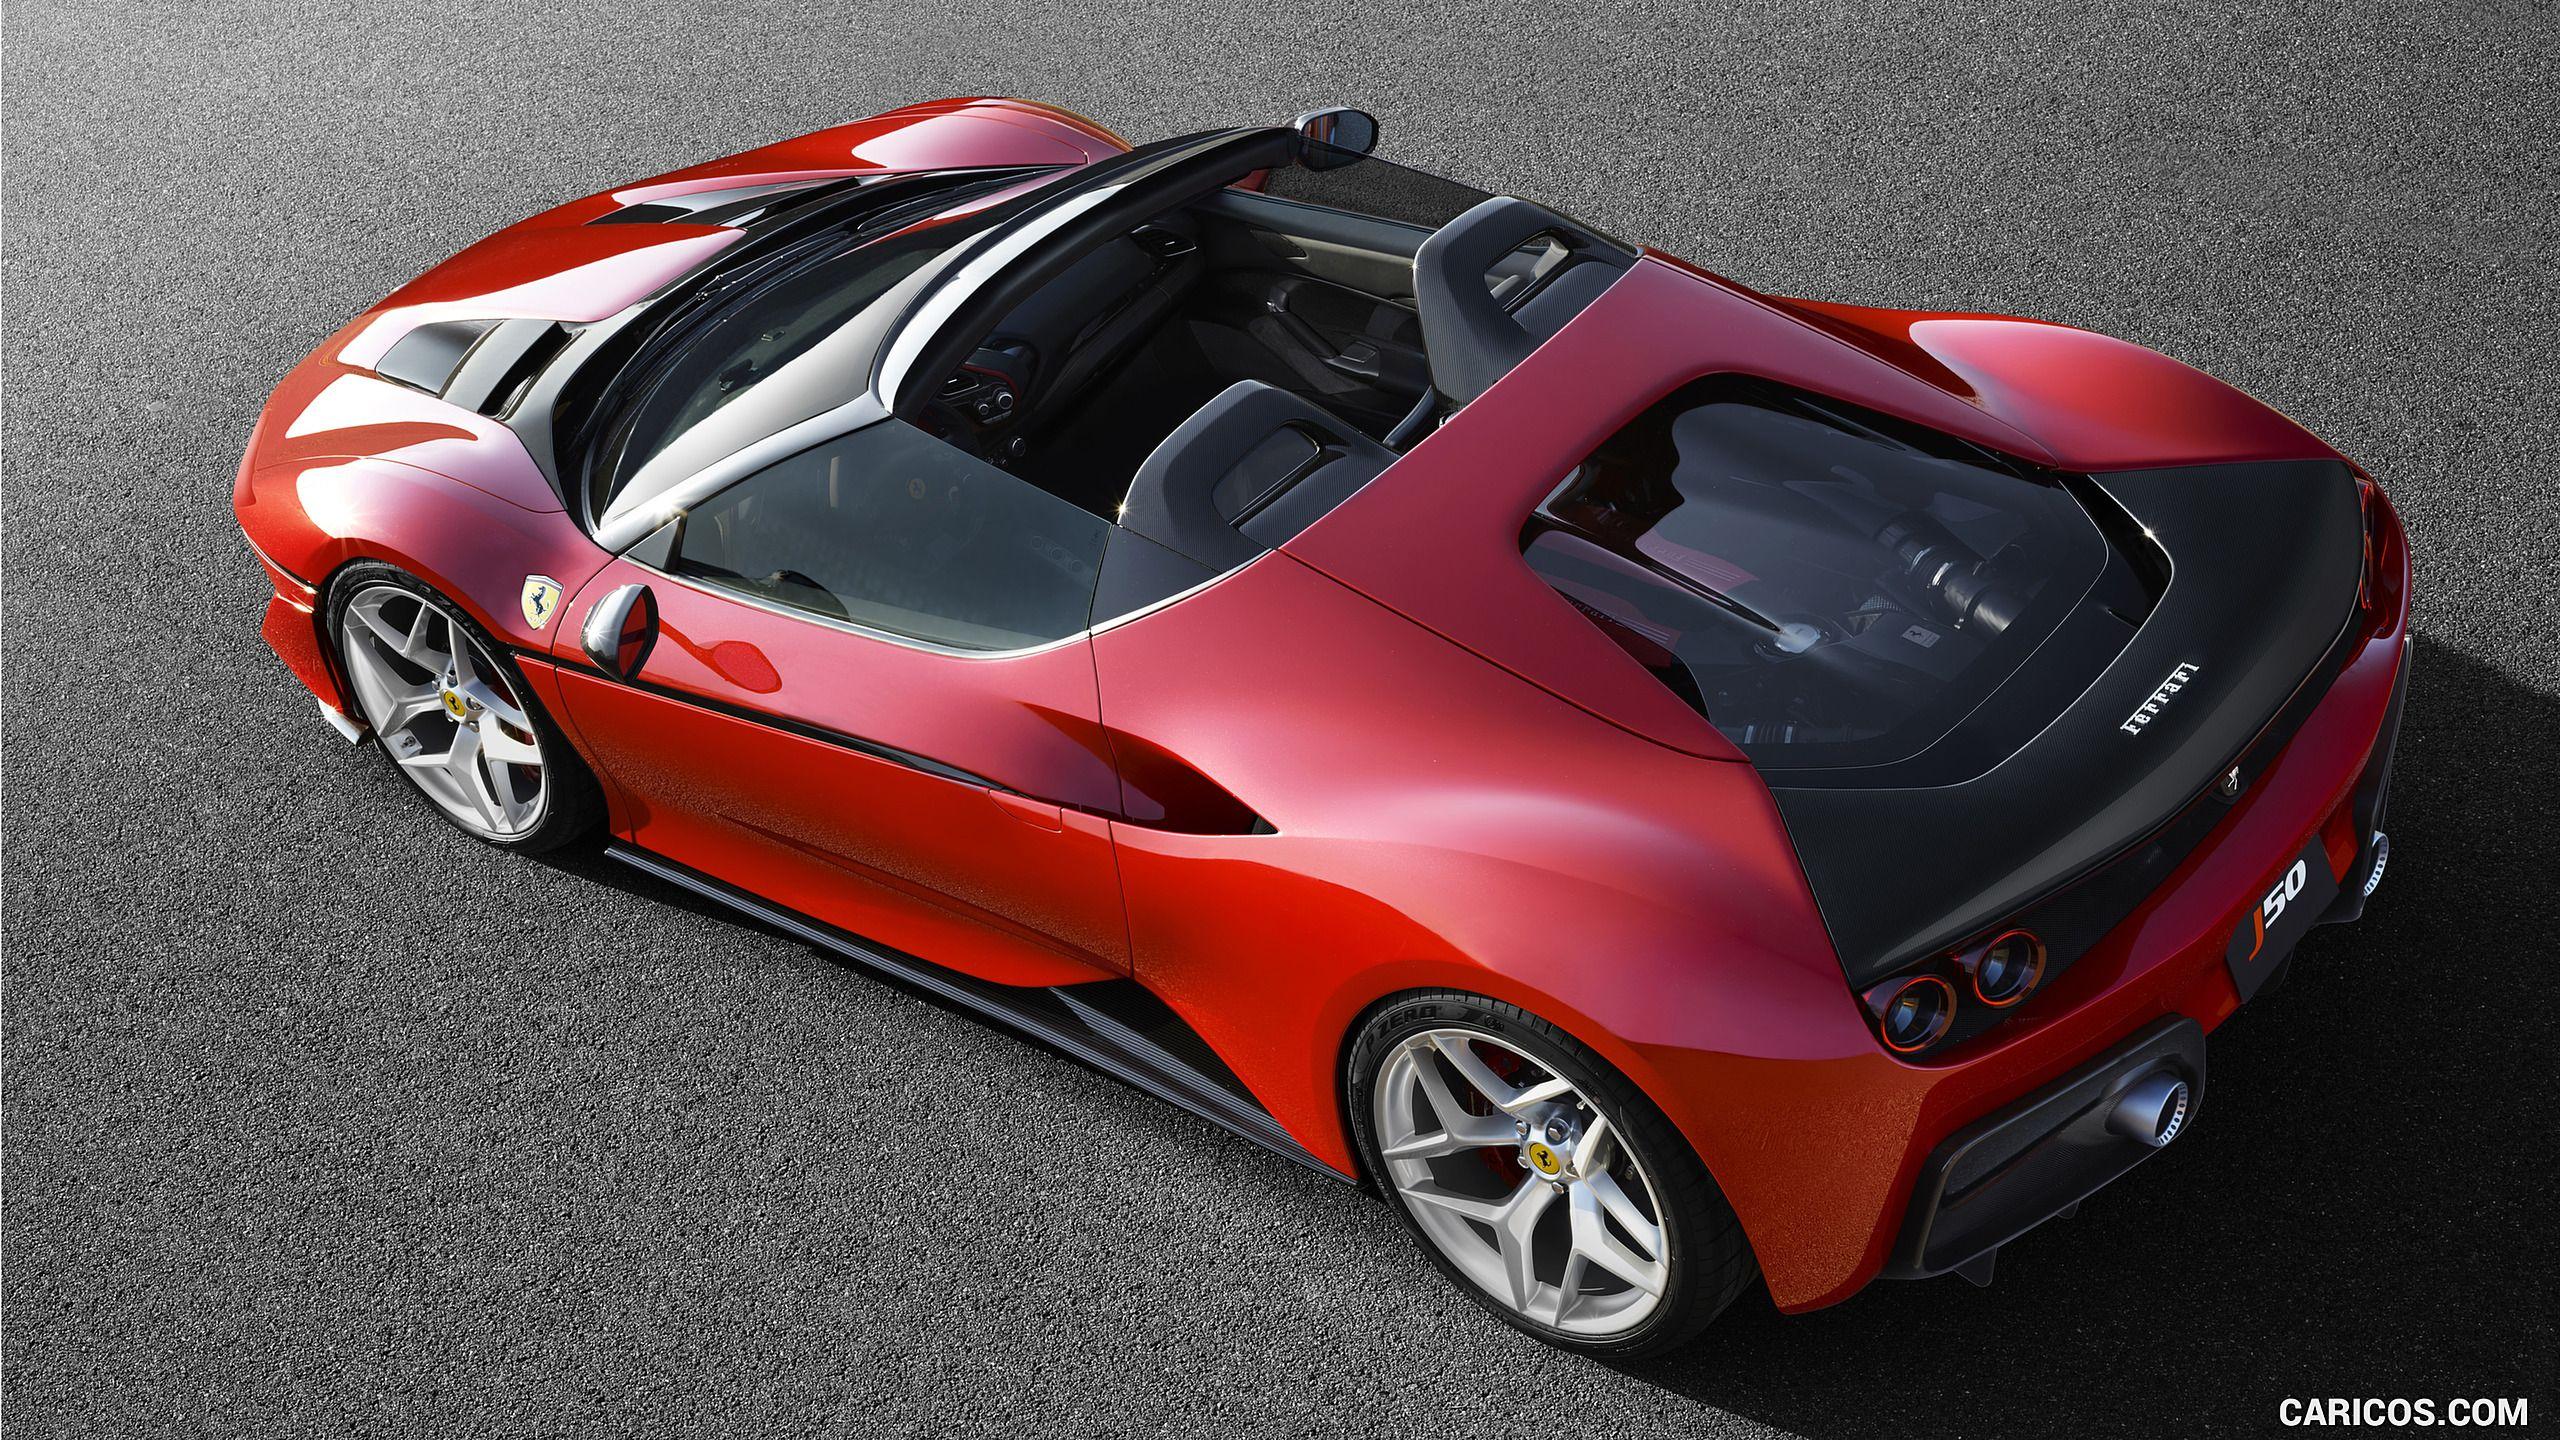 2017 Ferrari J50 Wallpaper